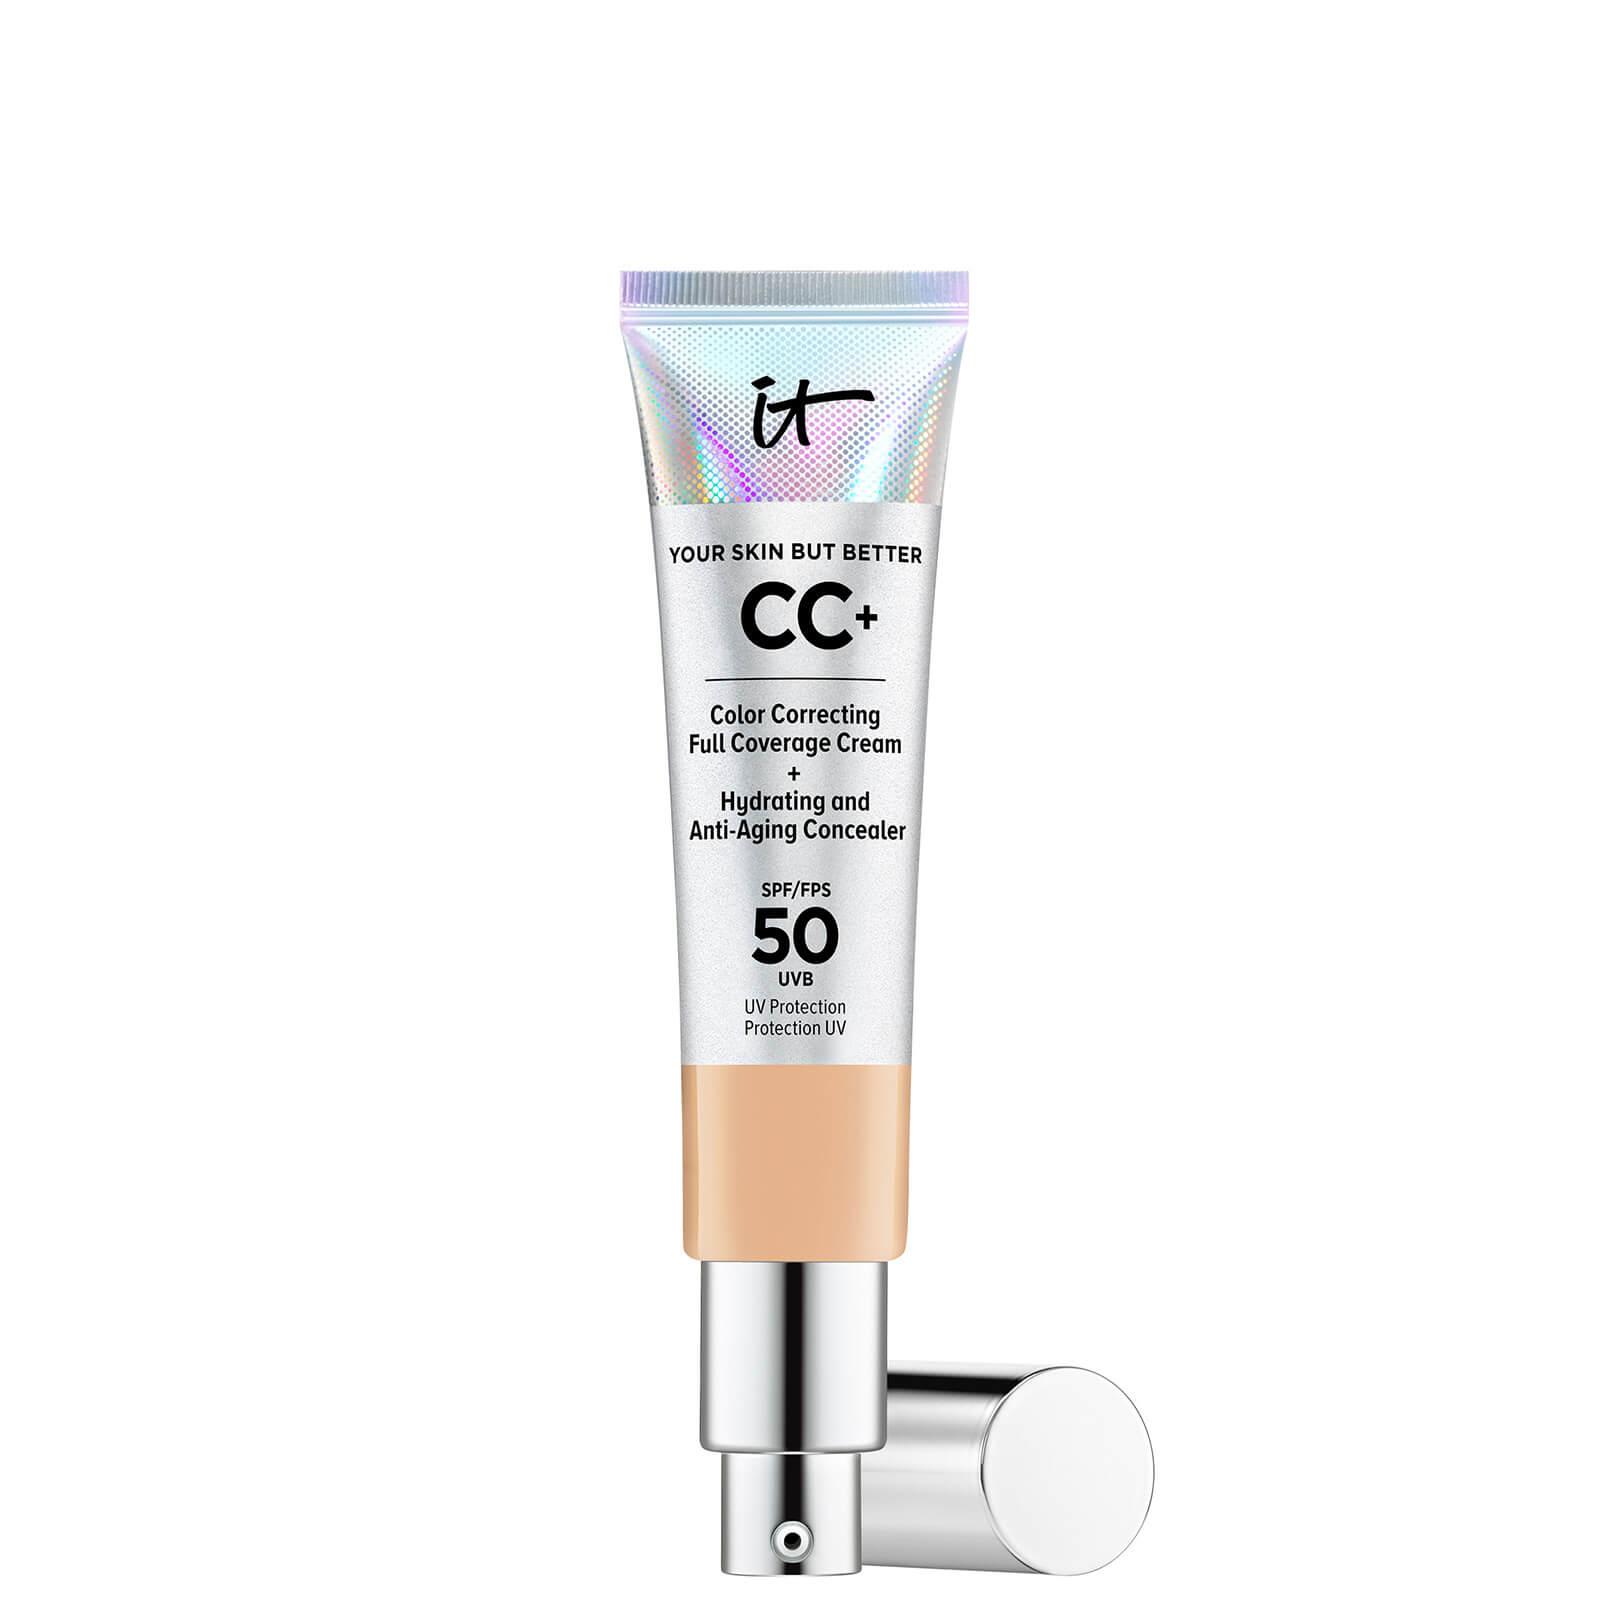 Купить IT Cosmetics Your Skin But Better CC+ Cream with SPF50 32ml (Various Shades) - Medium Tan